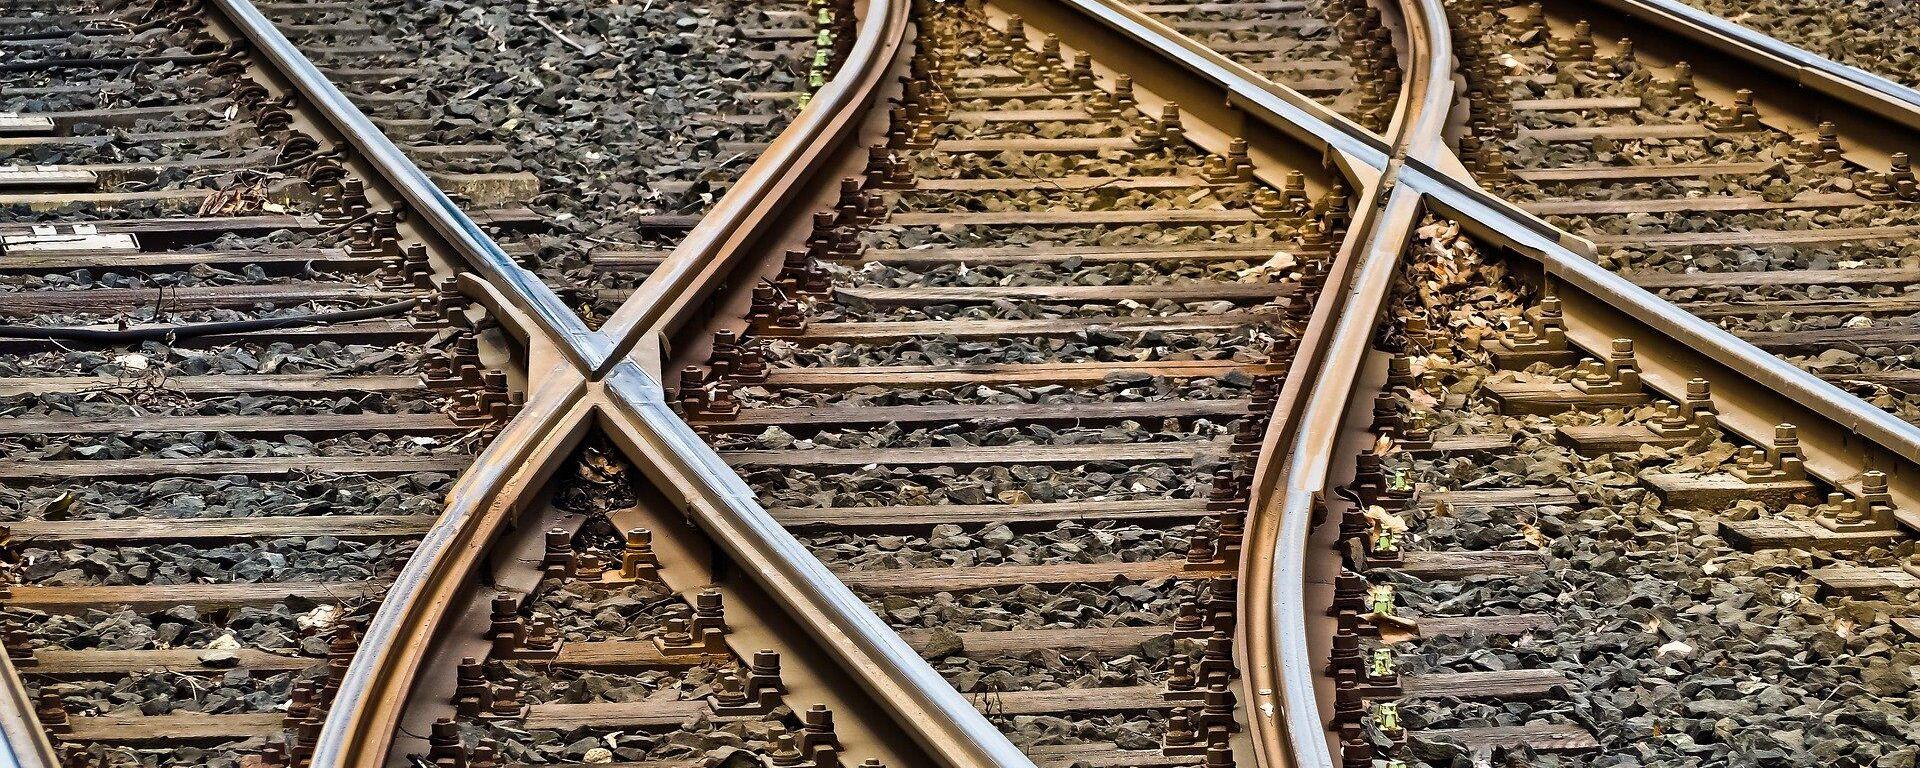 Ferrocarril (imagen referencial) - Sputnik Mundo, 1920, 22.03.2021